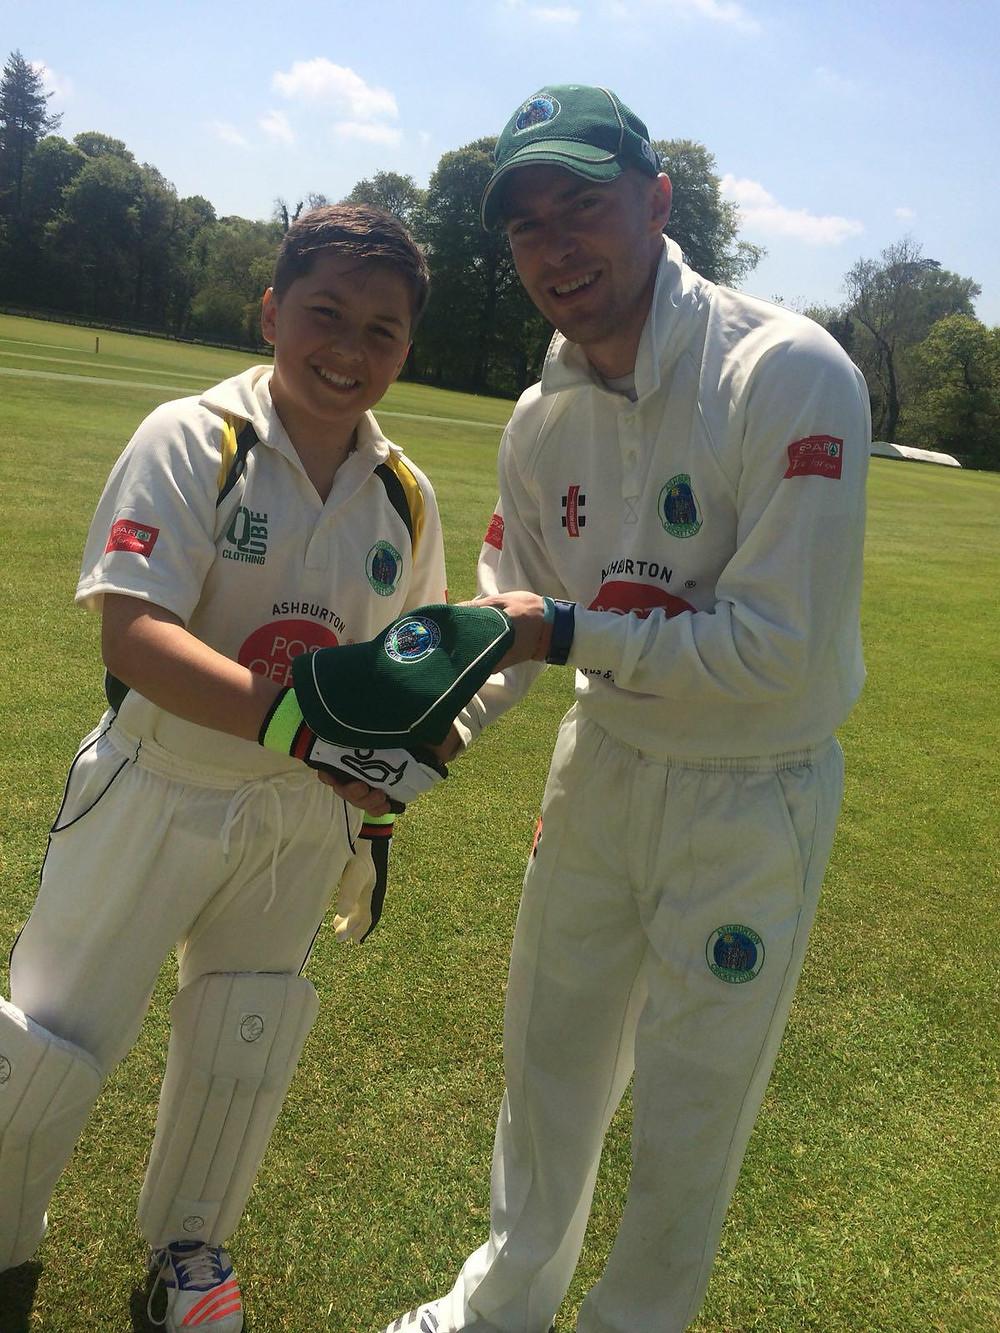 Tom Rush receives his 1st XI cap from skipper Ash Berry